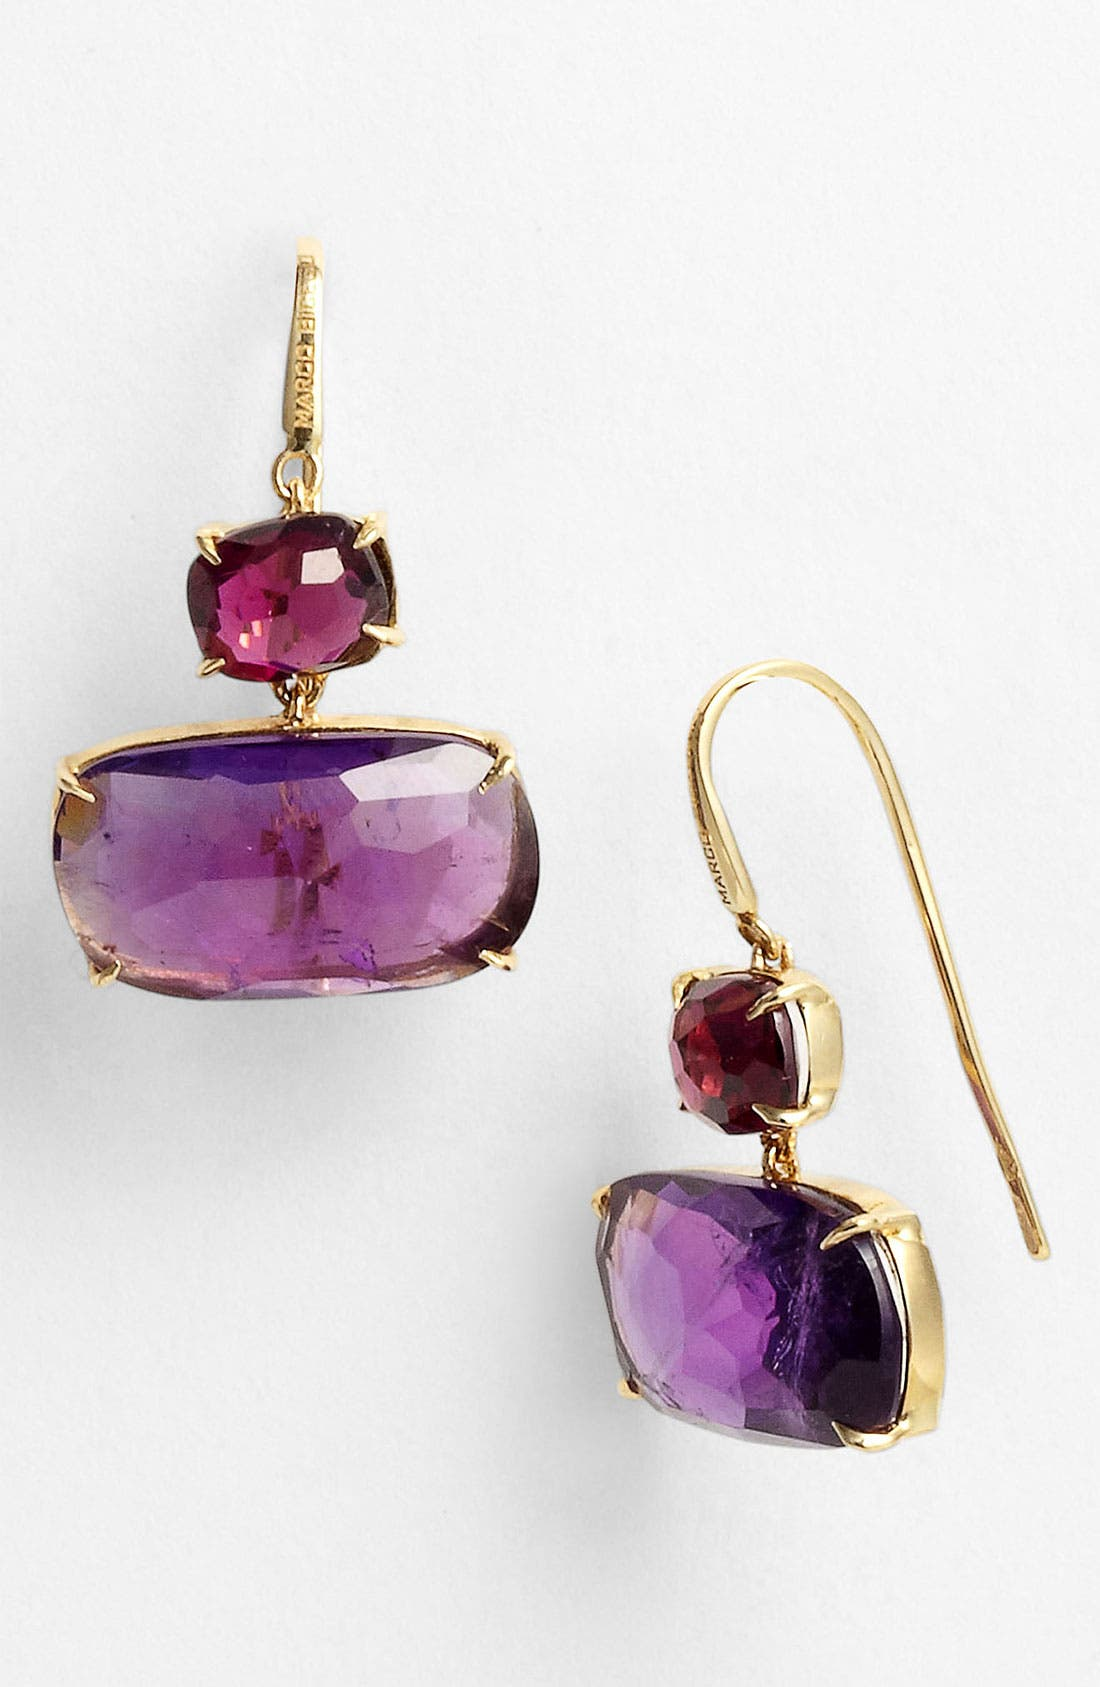 Main Image - Marco Bicego 'Murano' Garnet & Amethyst Drop Earrings